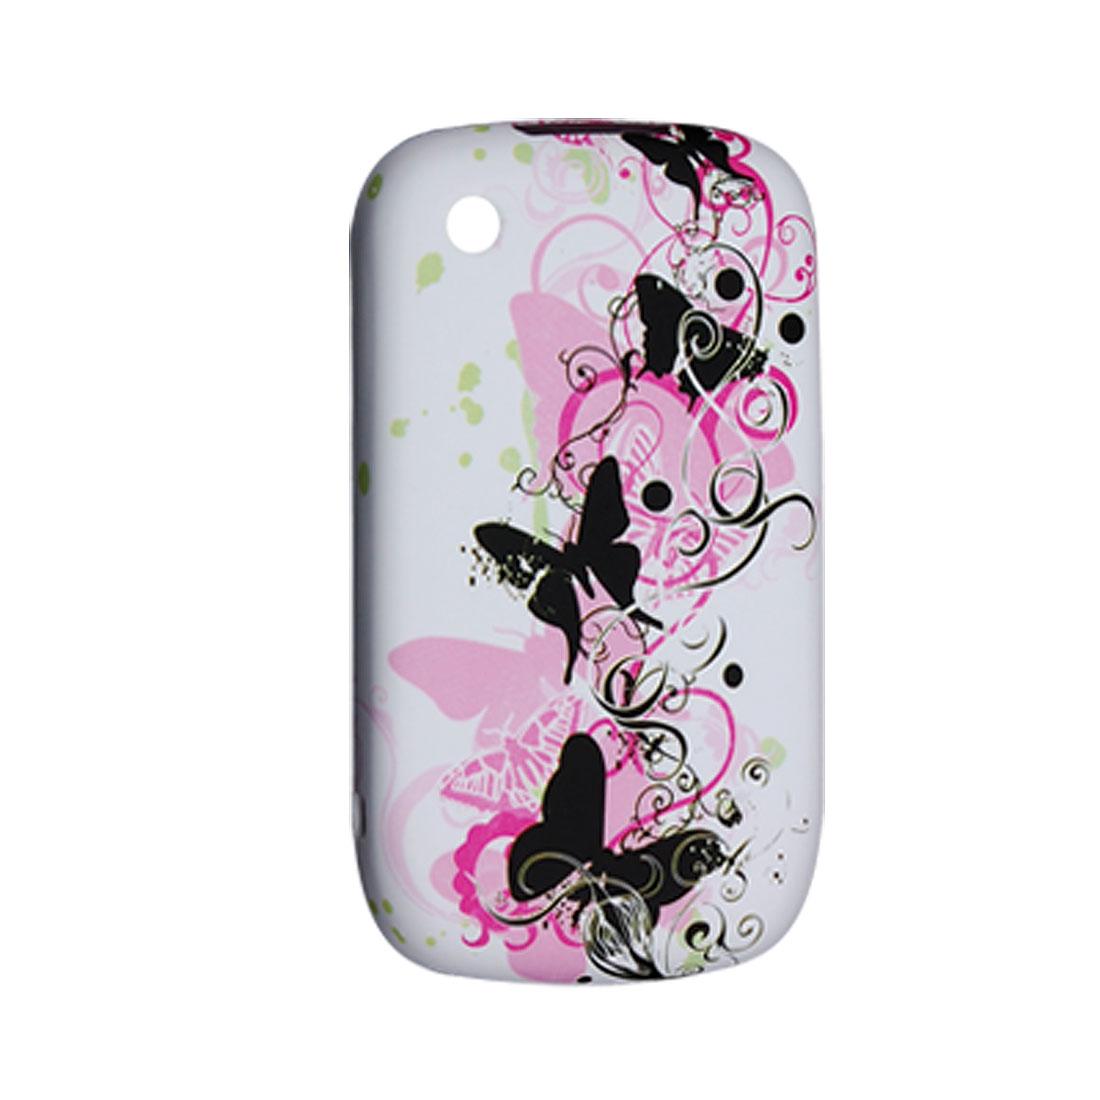 Soft Plastic Butterfly Print Shield Case for Blackberry 8520